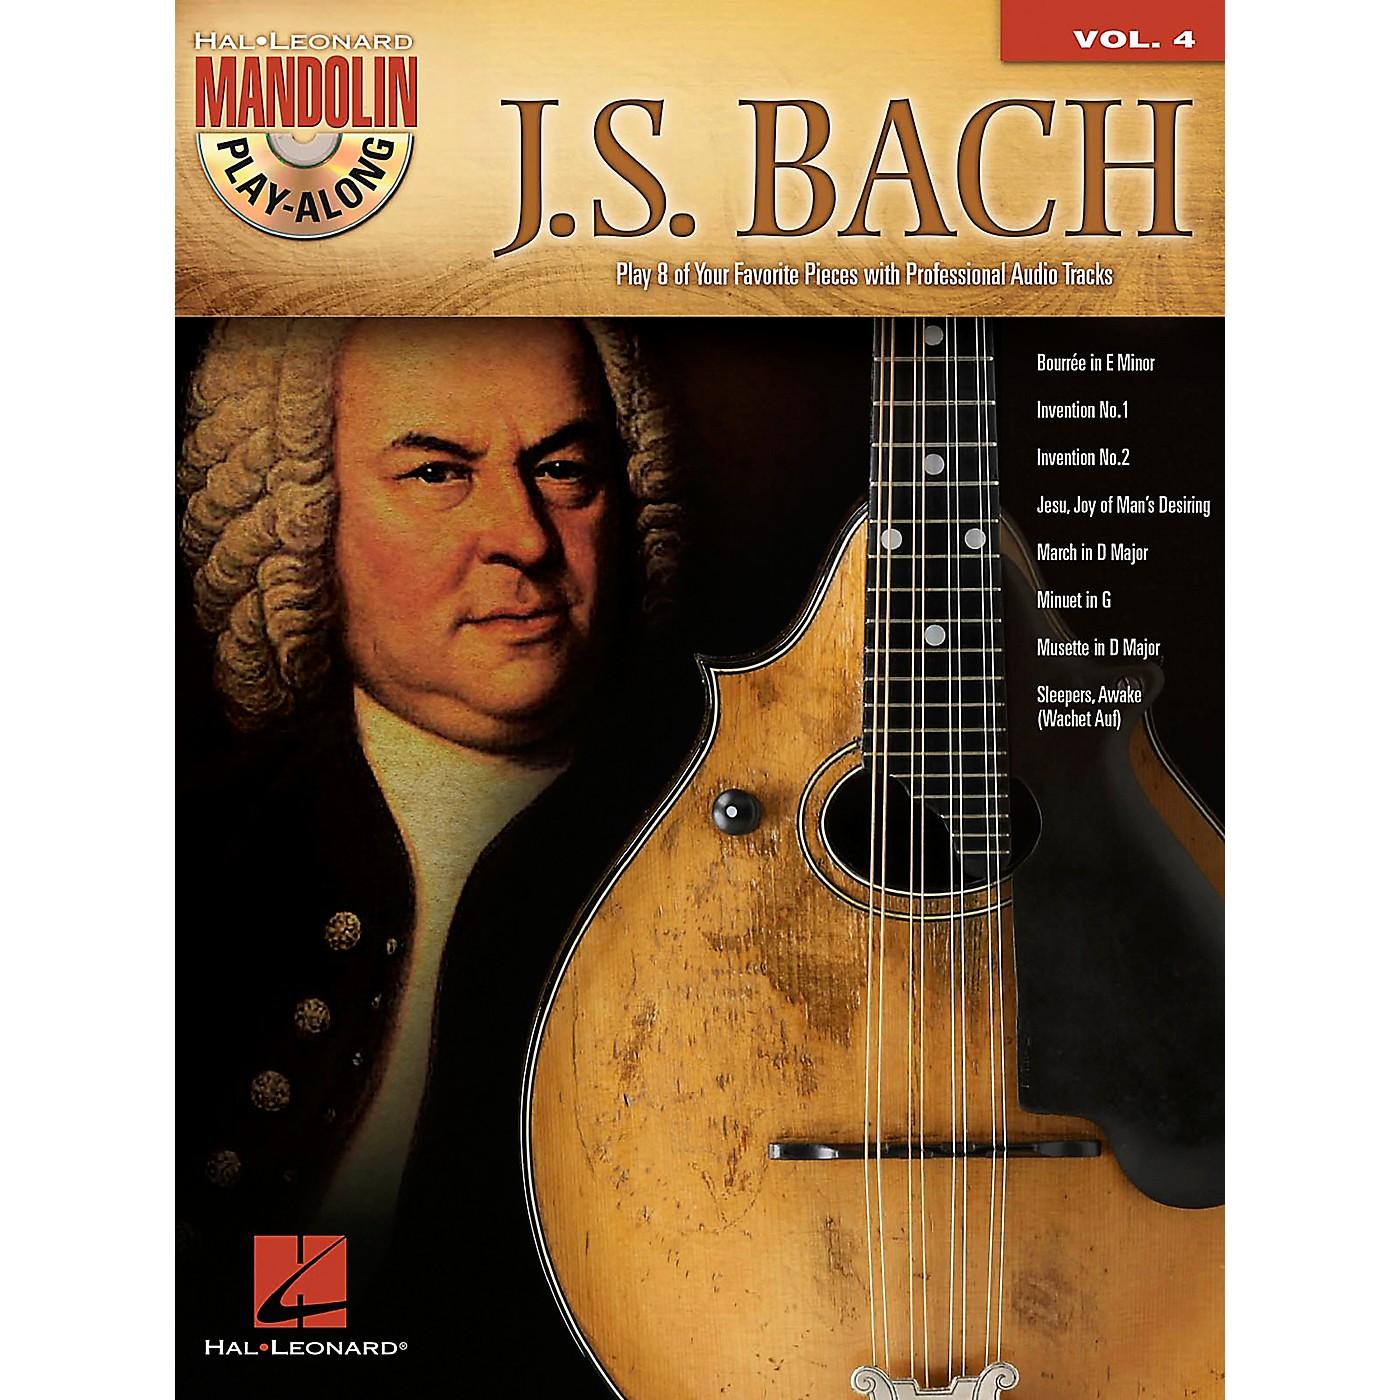 Hal Leonard J.S. Bach - Mandolin Play-Along Vol. 4 Book/CD thumbnail